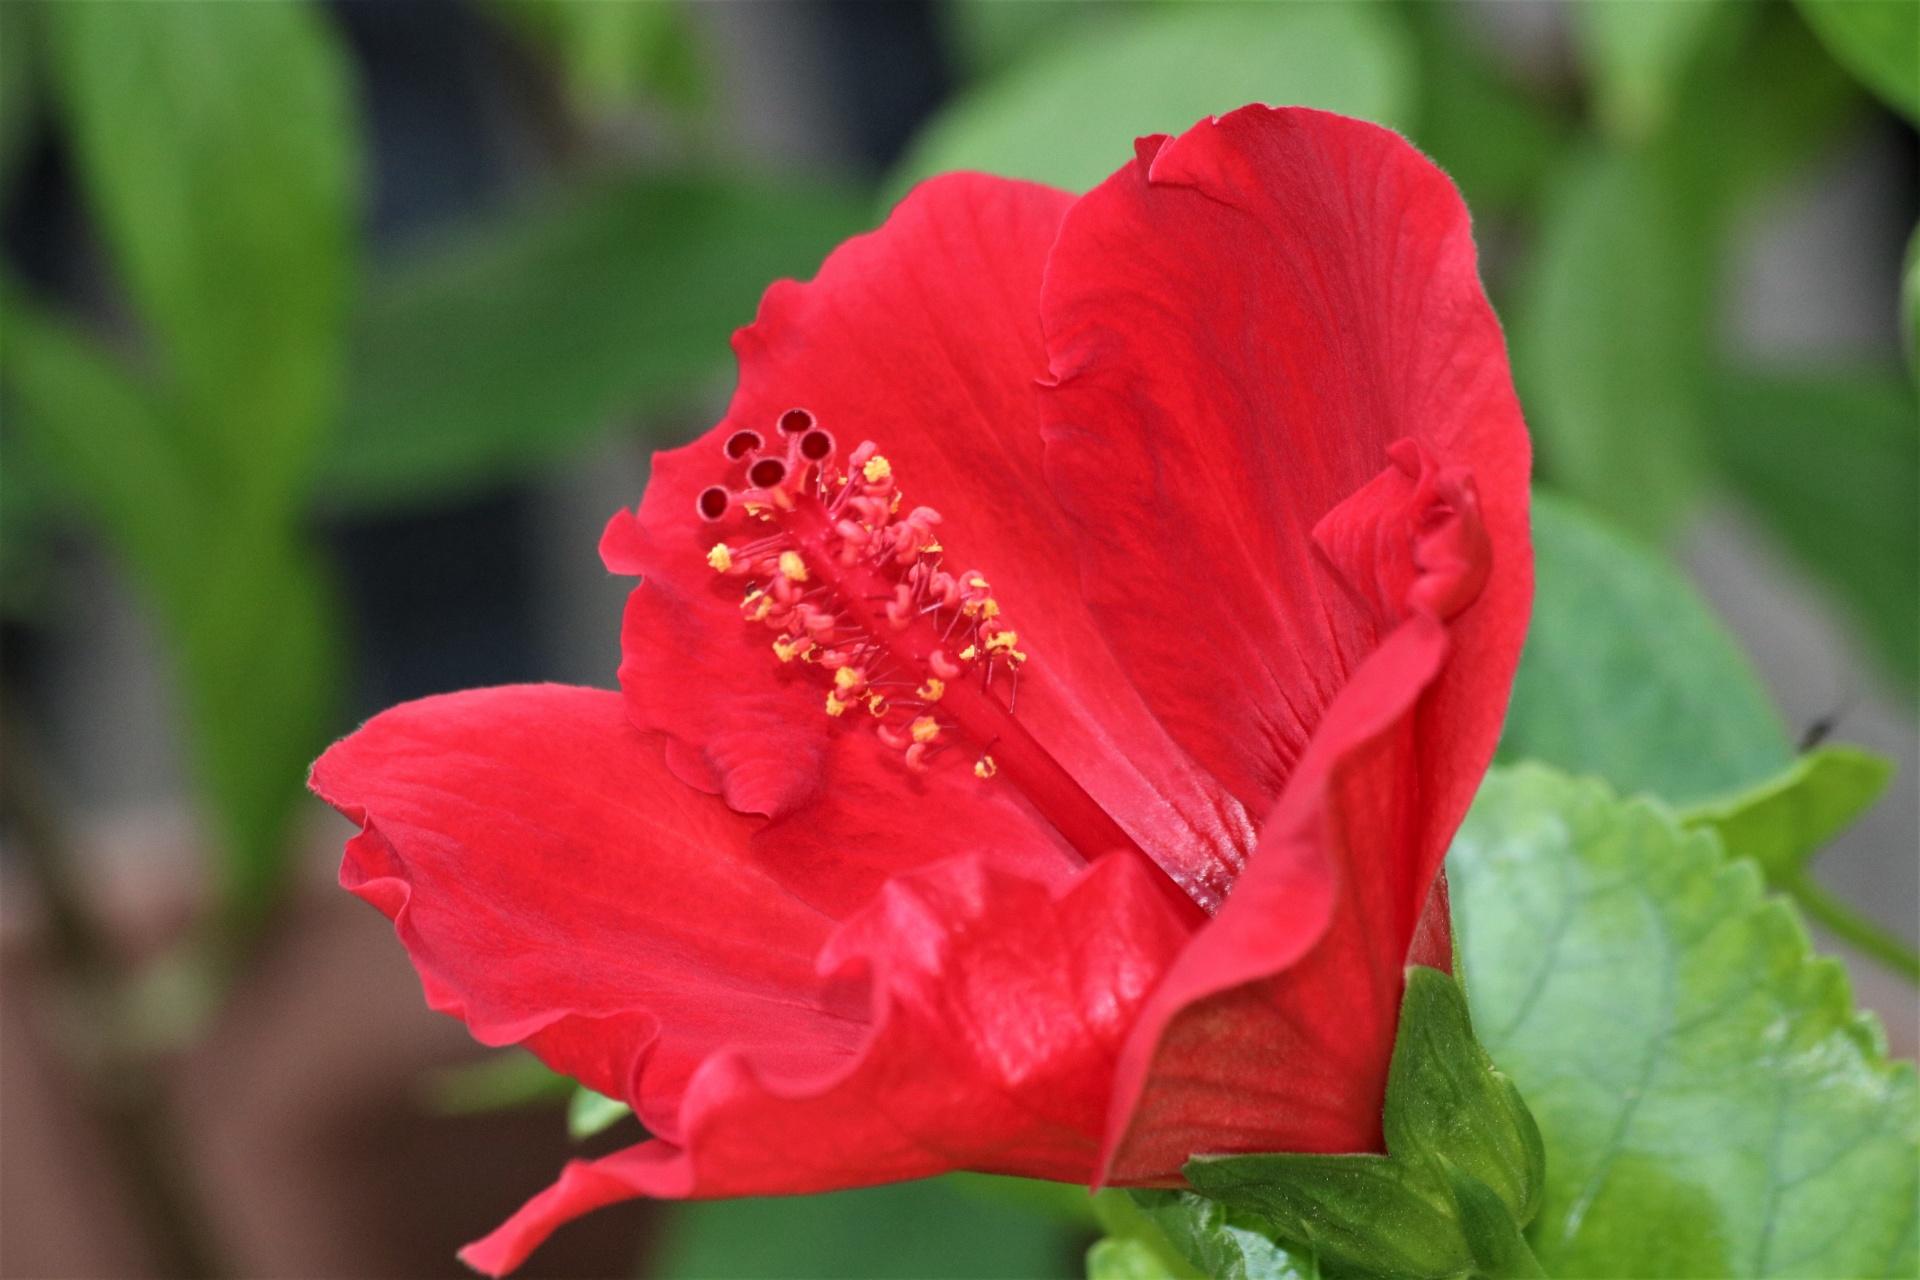 Natureplantsflowersrednbspflowersflora Free Photo From